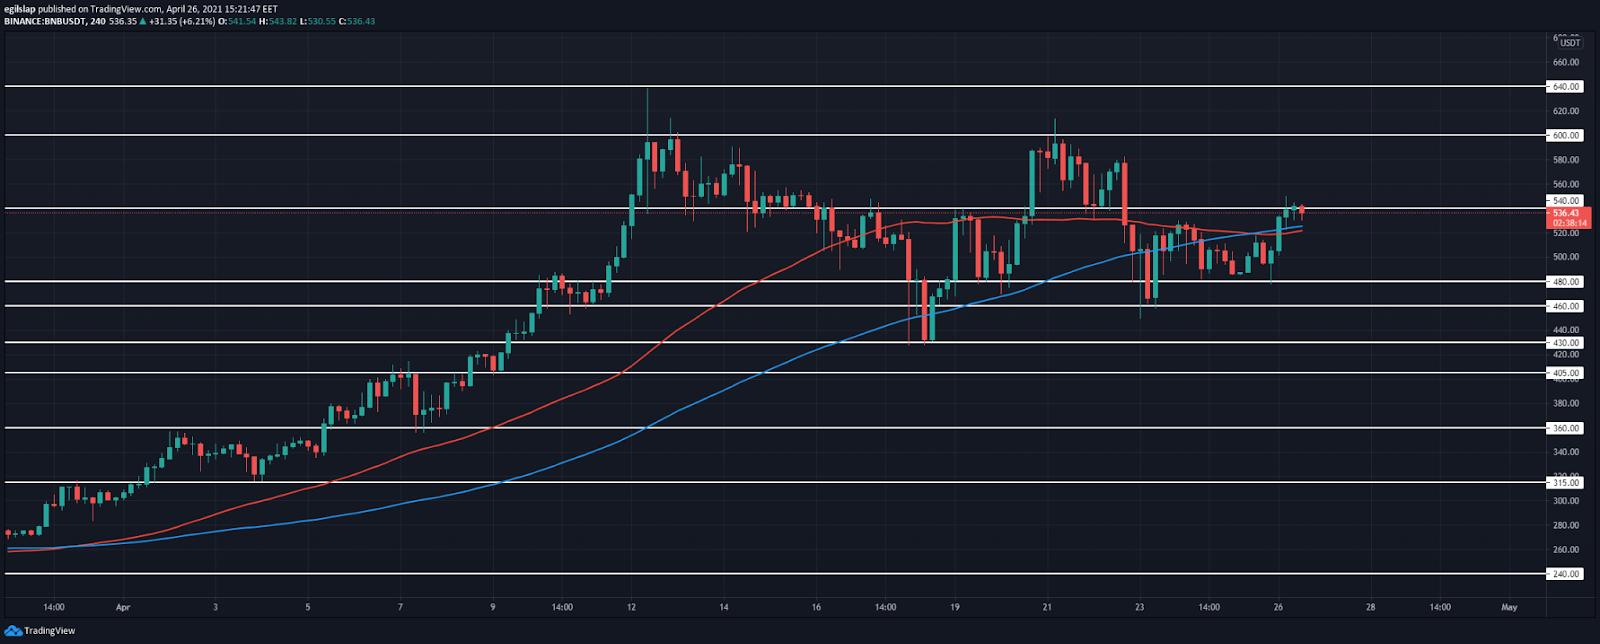 Weekly Crypto Price Analysis 26th Apr: BTC, ETH, BNB, VET, UNI 3